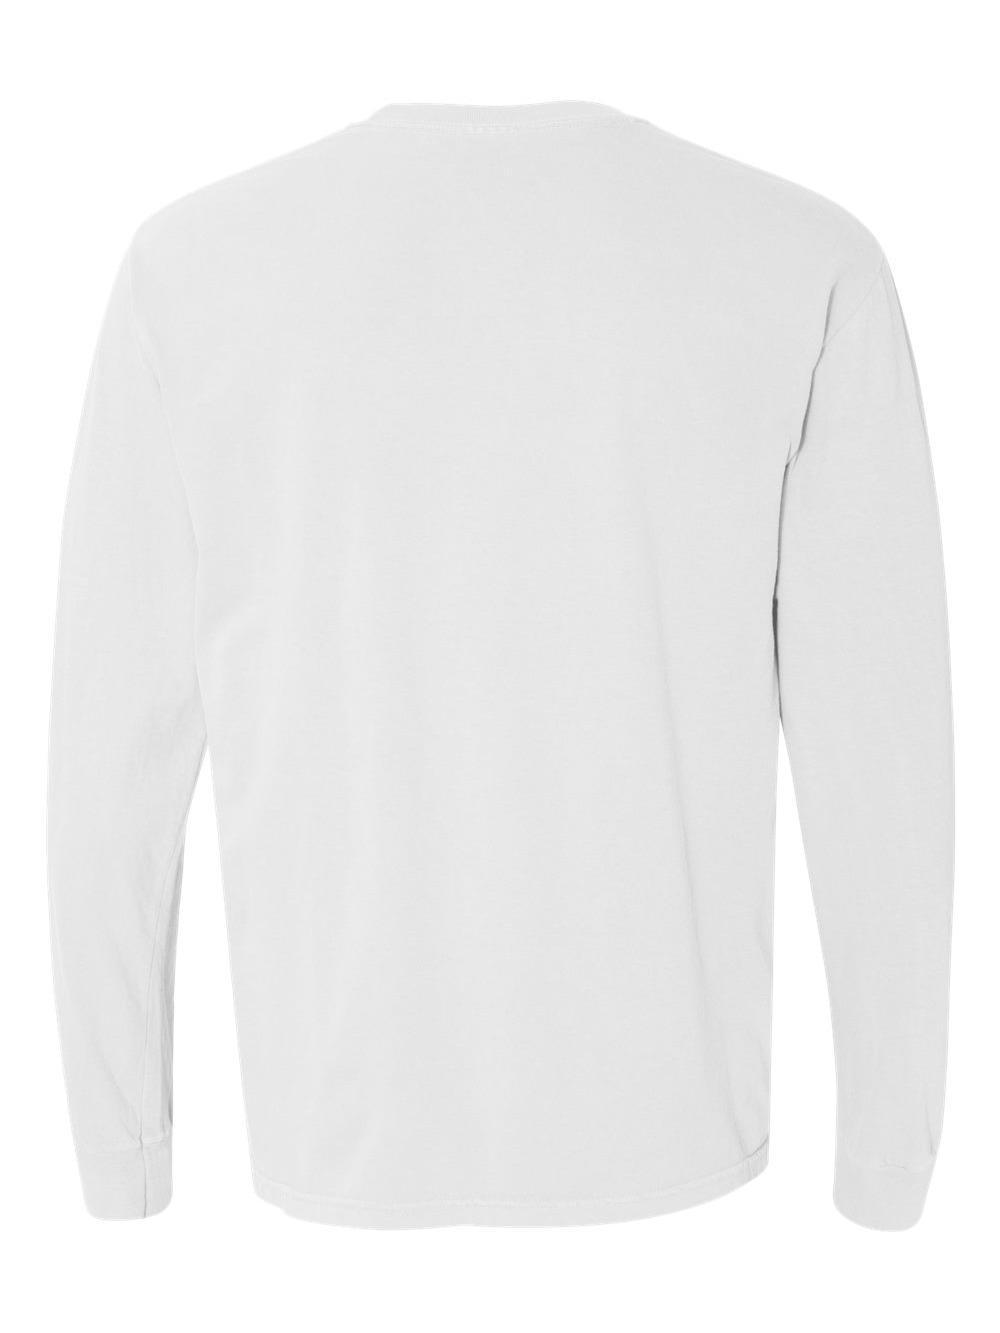 Comfort-Colors-Garment-Dyed-Heavyweight-Ringspun-Long-Sleeve-T-Shirt-6014 thumbnail 73